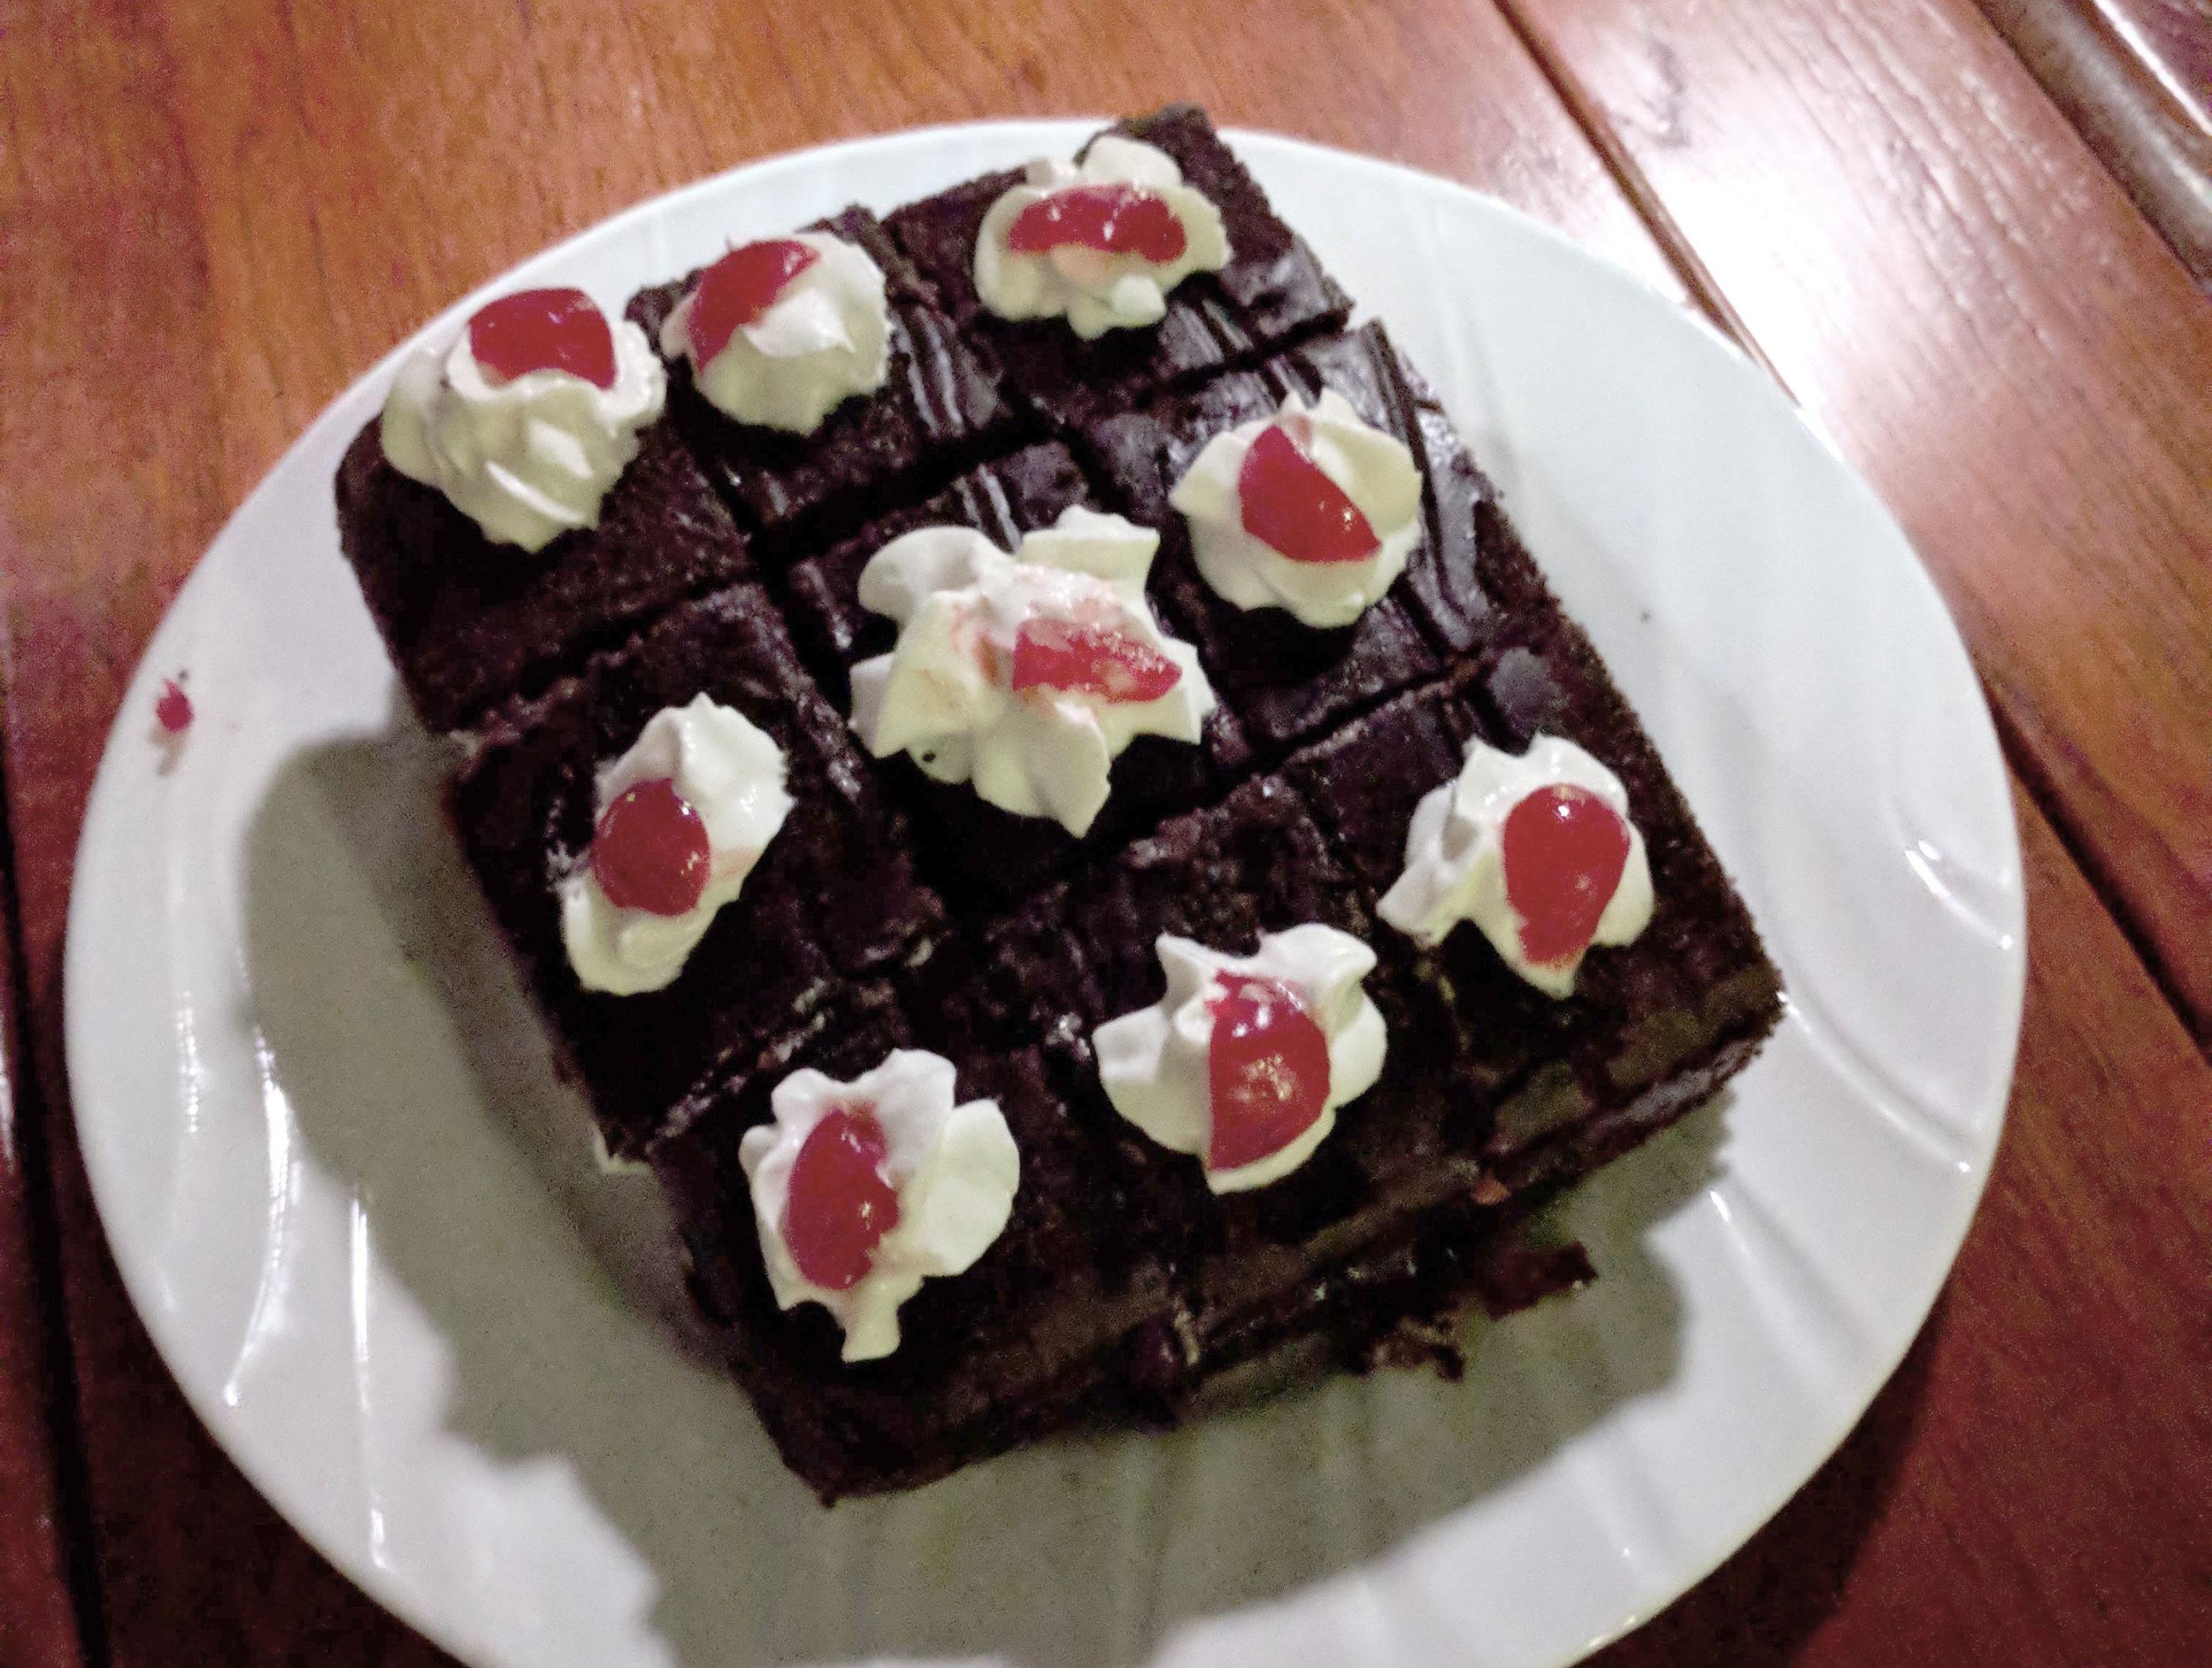 A twist on Black Forest cake.